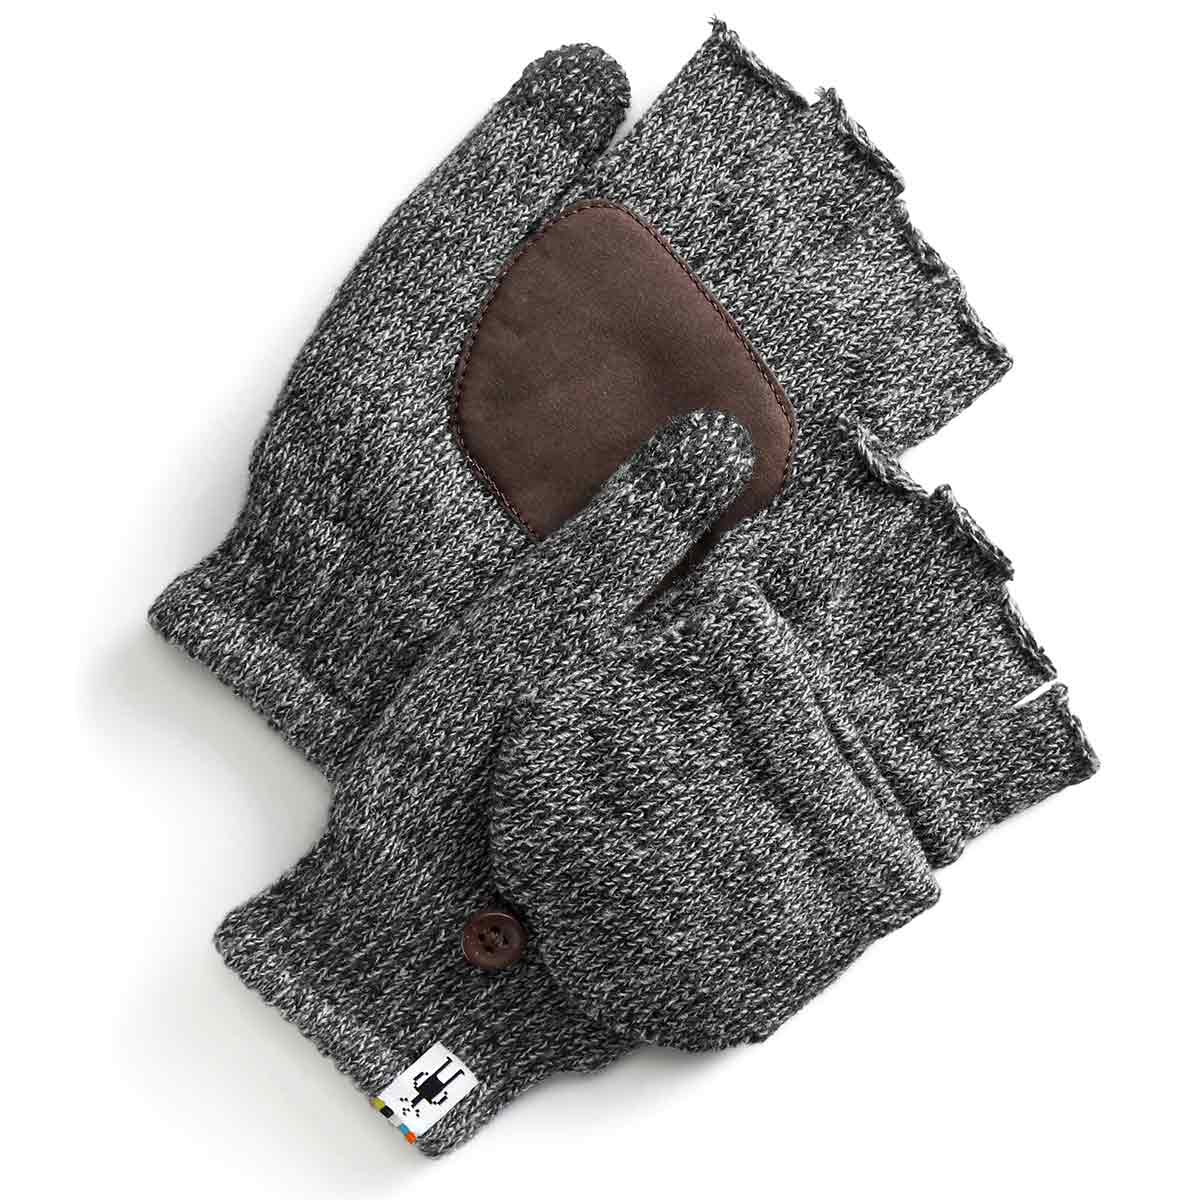 Smartwool Men's Cozy Grip Flip Mitts - Black, L/XL